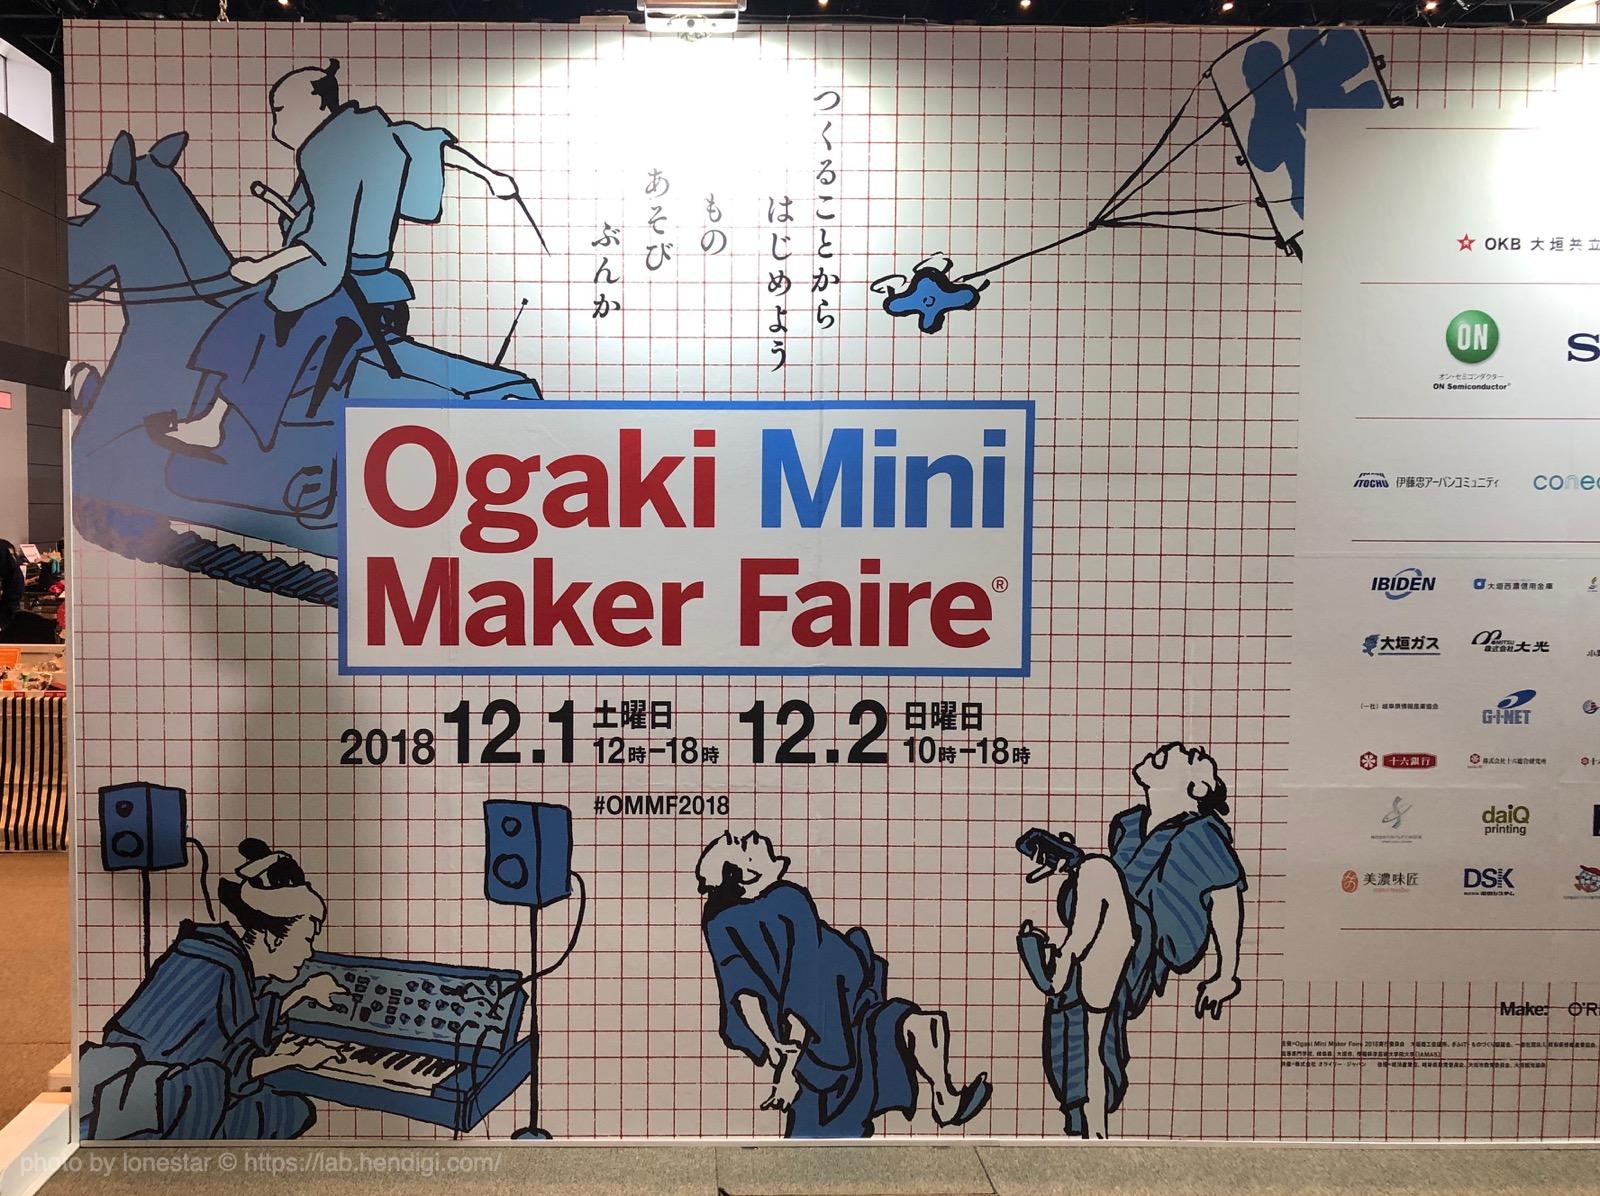 Ogaki Mini Maker Faire 2018